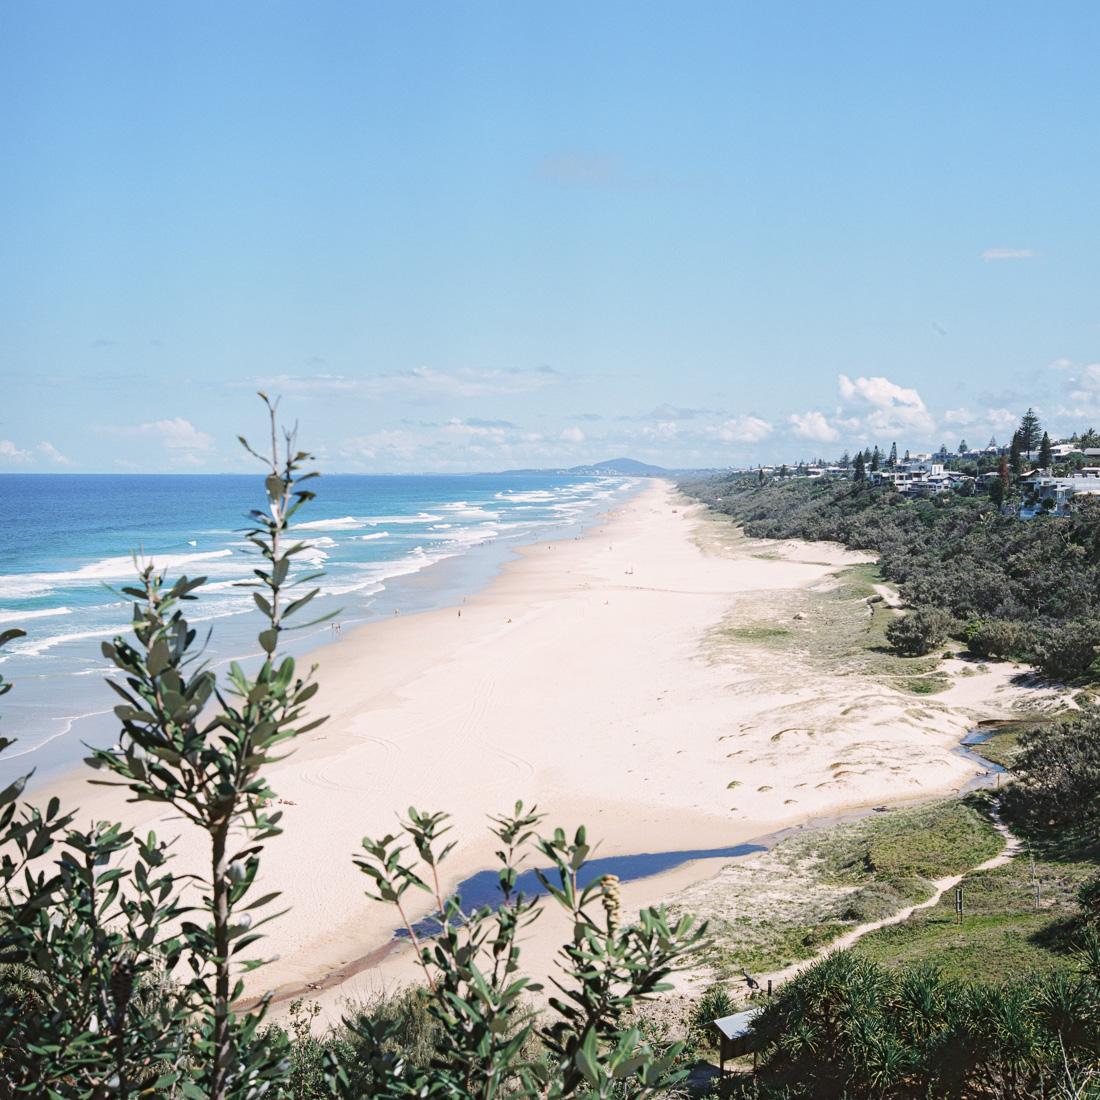 Sunshine Beach, literally.